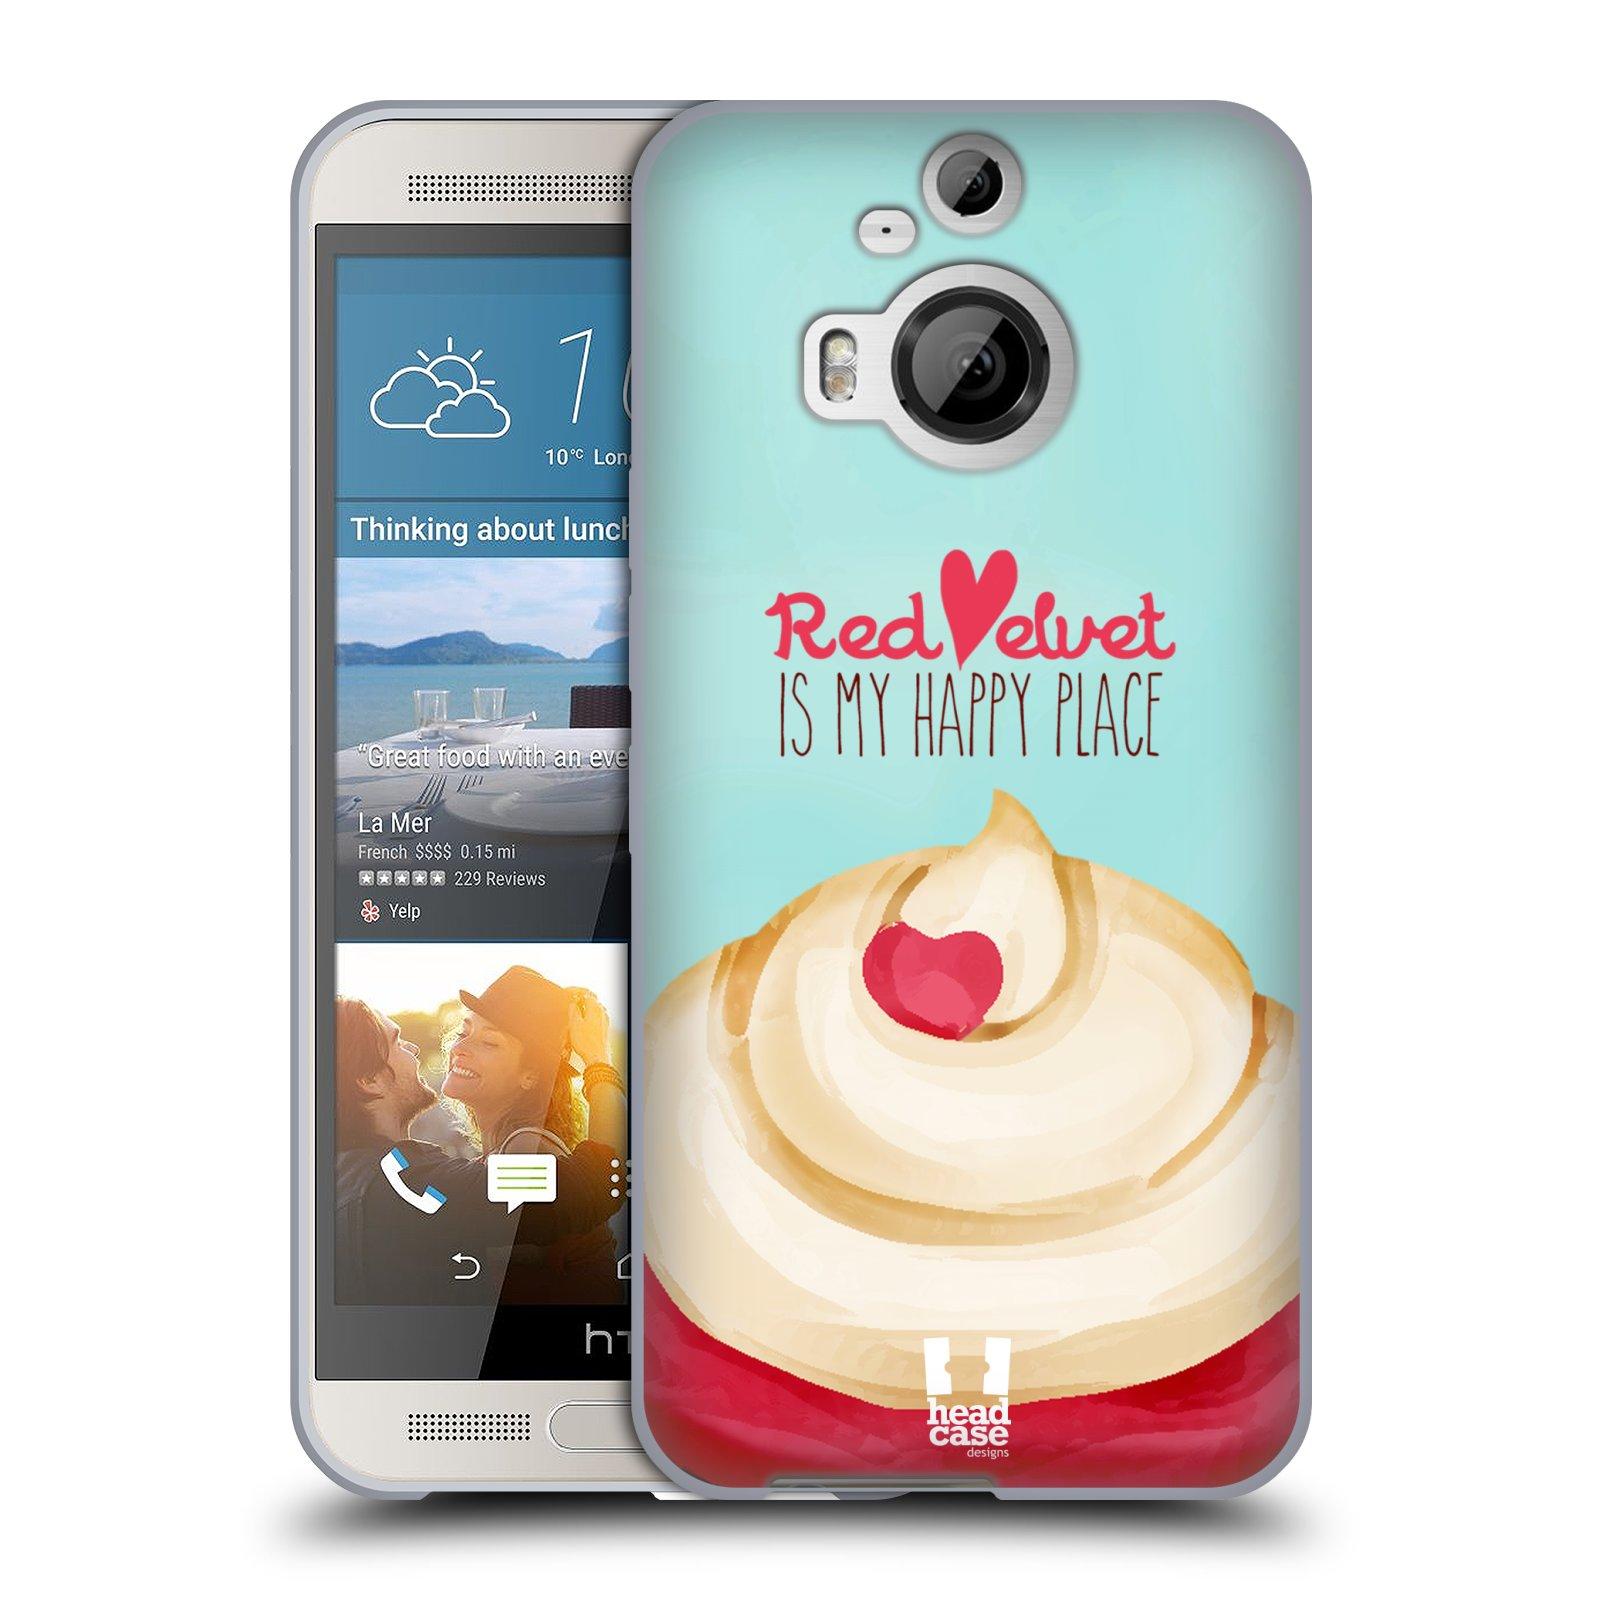 Silikonové pouzdro na mobil HTC One M9+ (Plus) HEAD CASE CUPCAKE RED VELVET (Silikonový kryt či obal na mobilní telefon HTC One M9+)